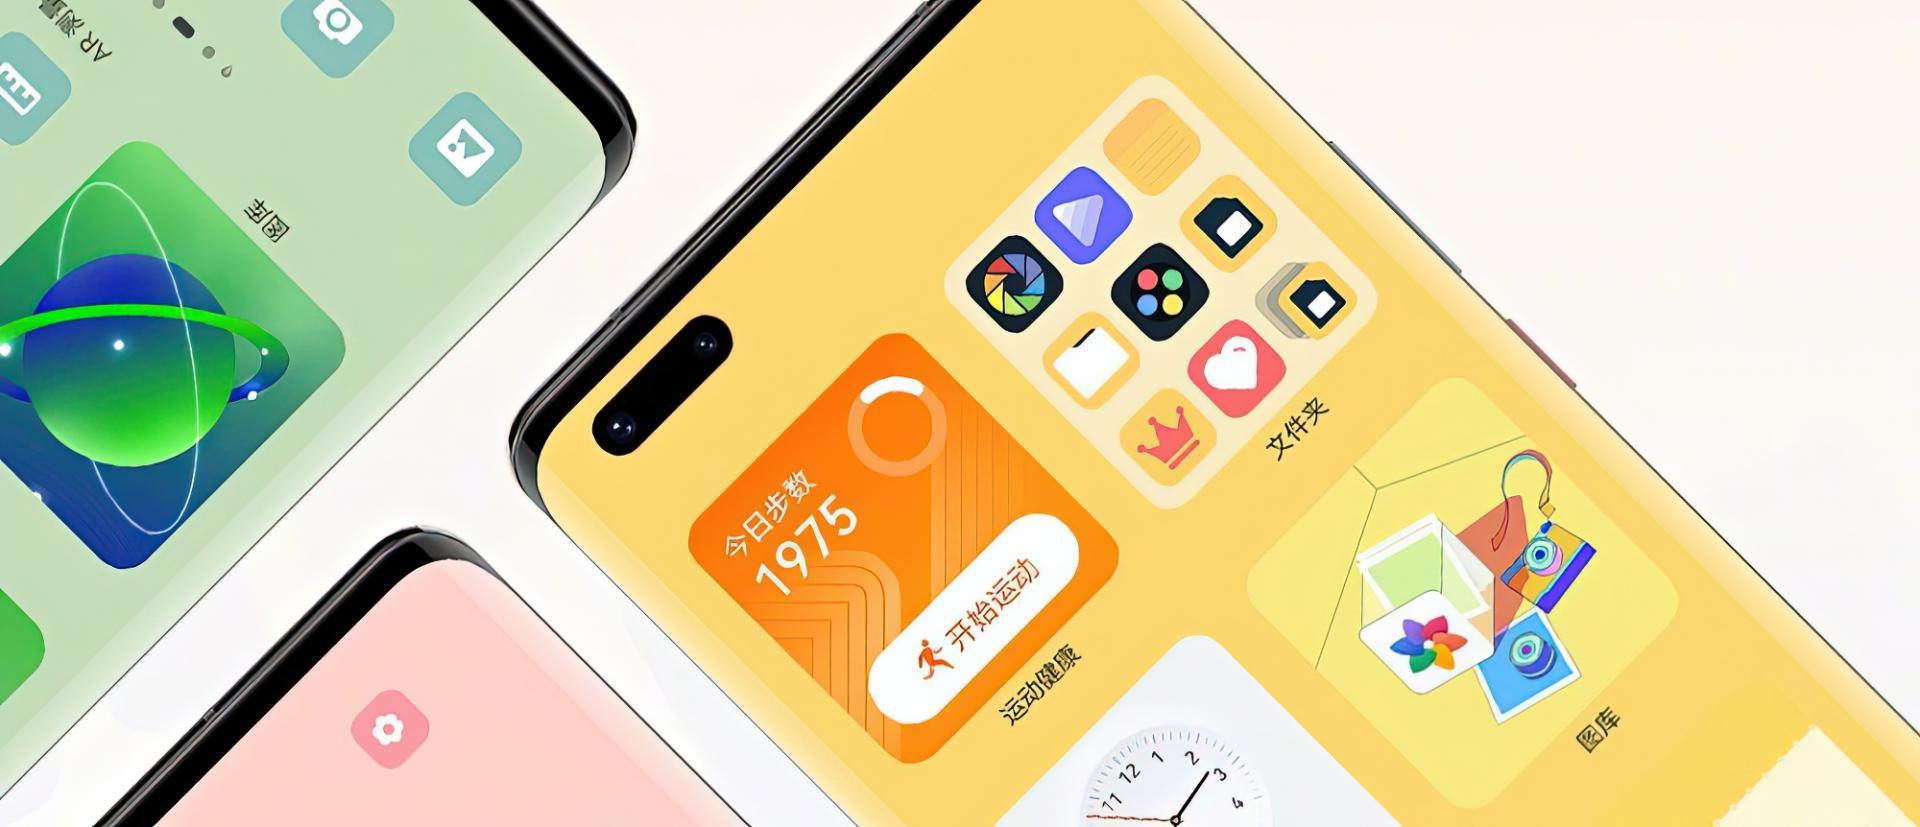 Стабильная Harmony OSужеготовадля 65 смартфонов HUAWEI иHONOR